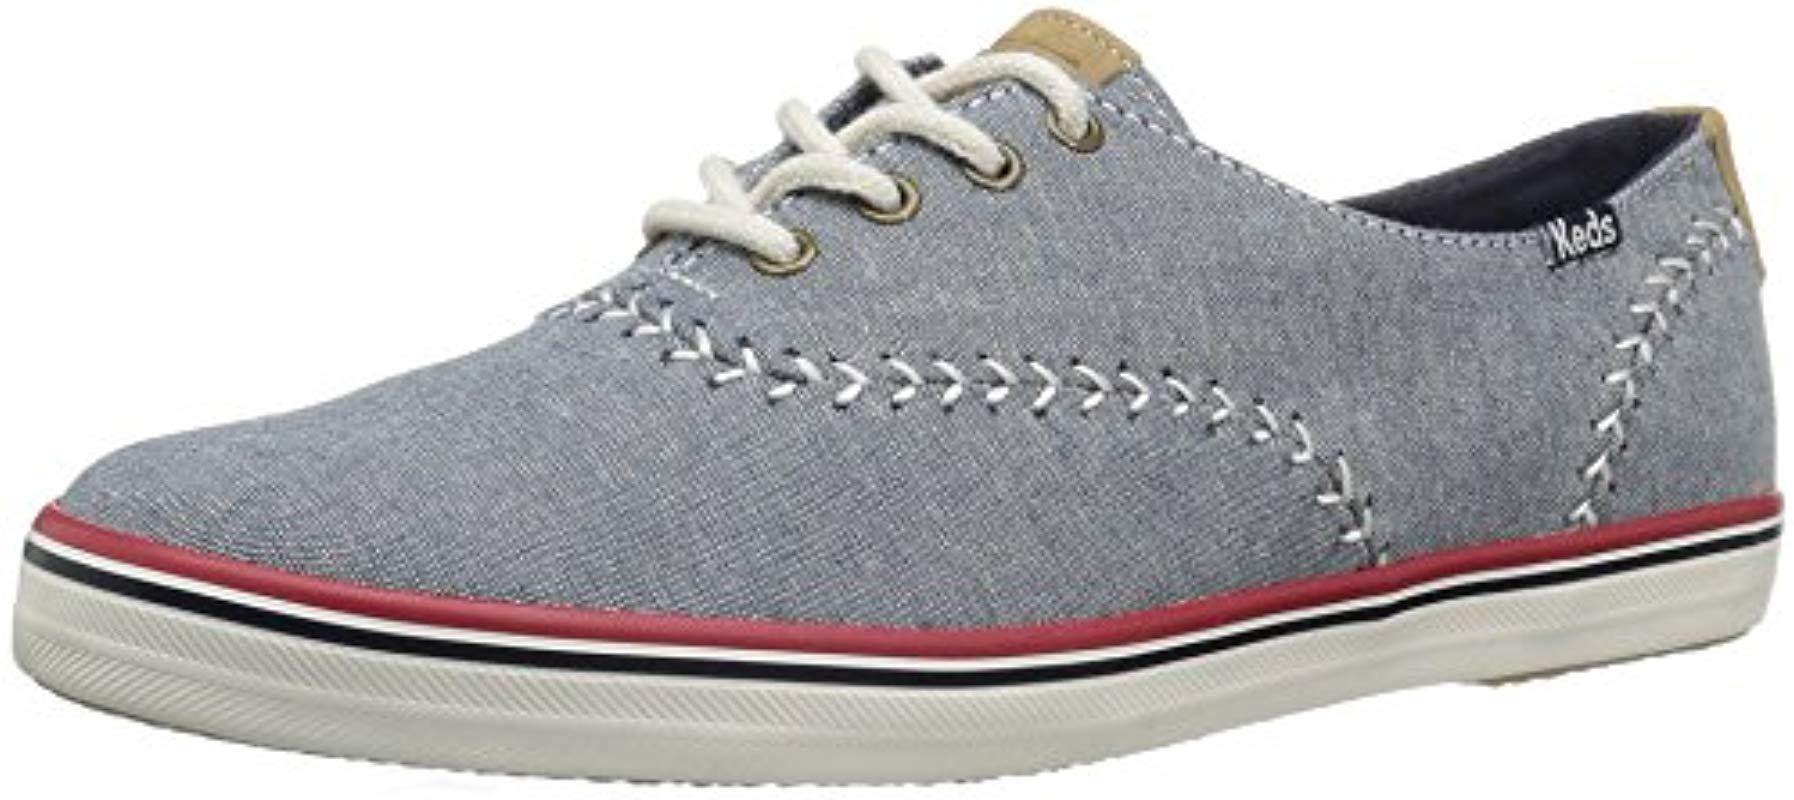 8c5d7617e59cb Lyst - Keds Champion Pennant Fashion Sneaker in Blue